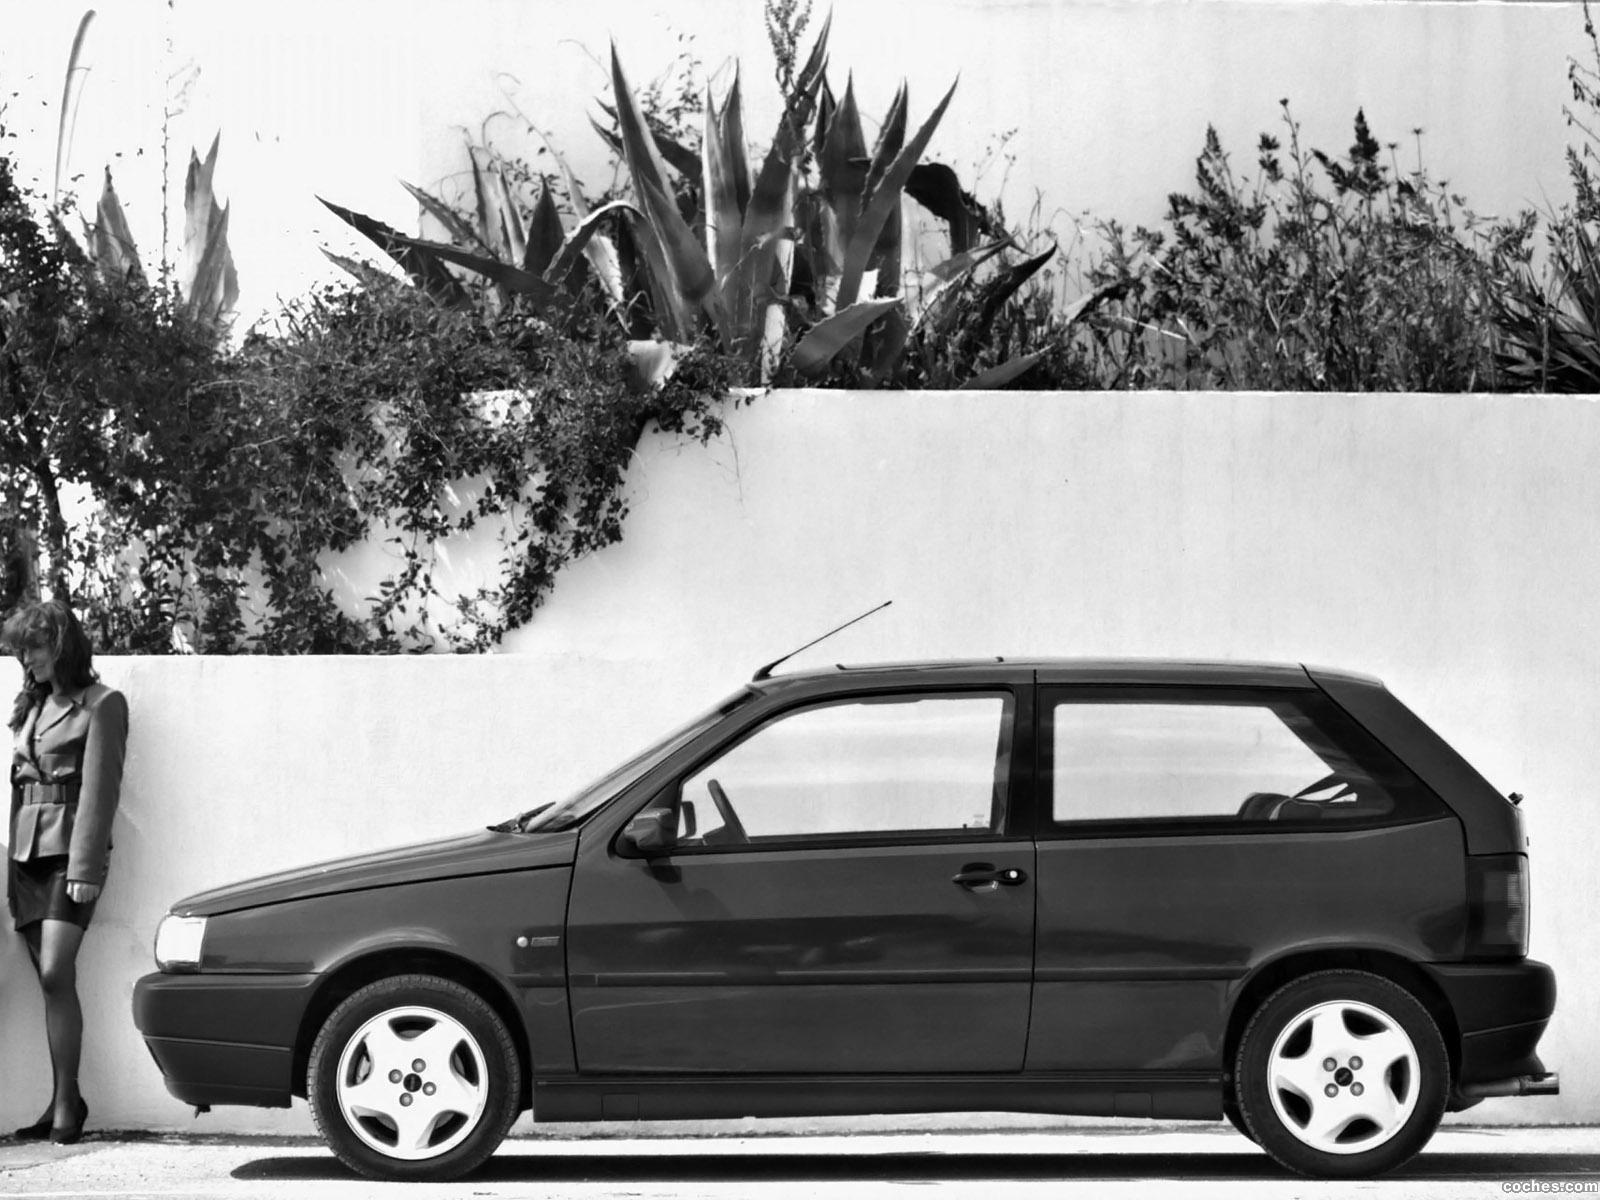 Foto 2 de Fiat Tipo 2.0 i.e. 16V  1993